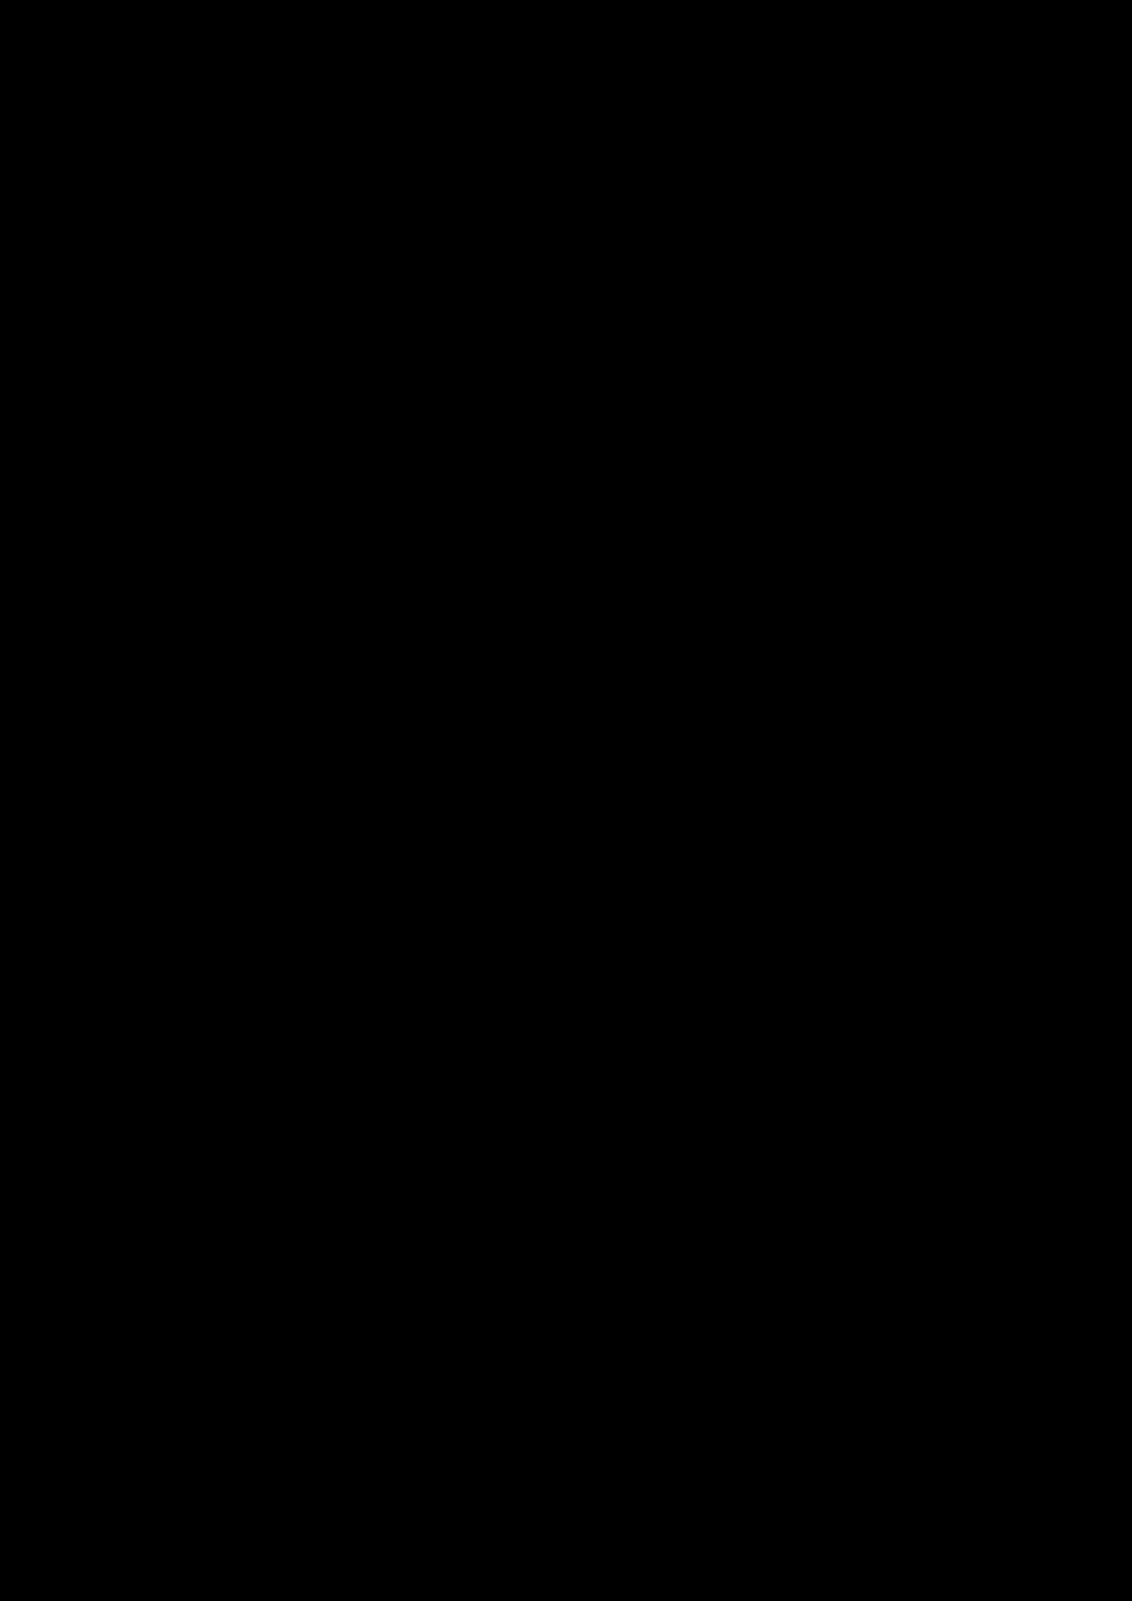 Belyiy sokol slide, Image 87